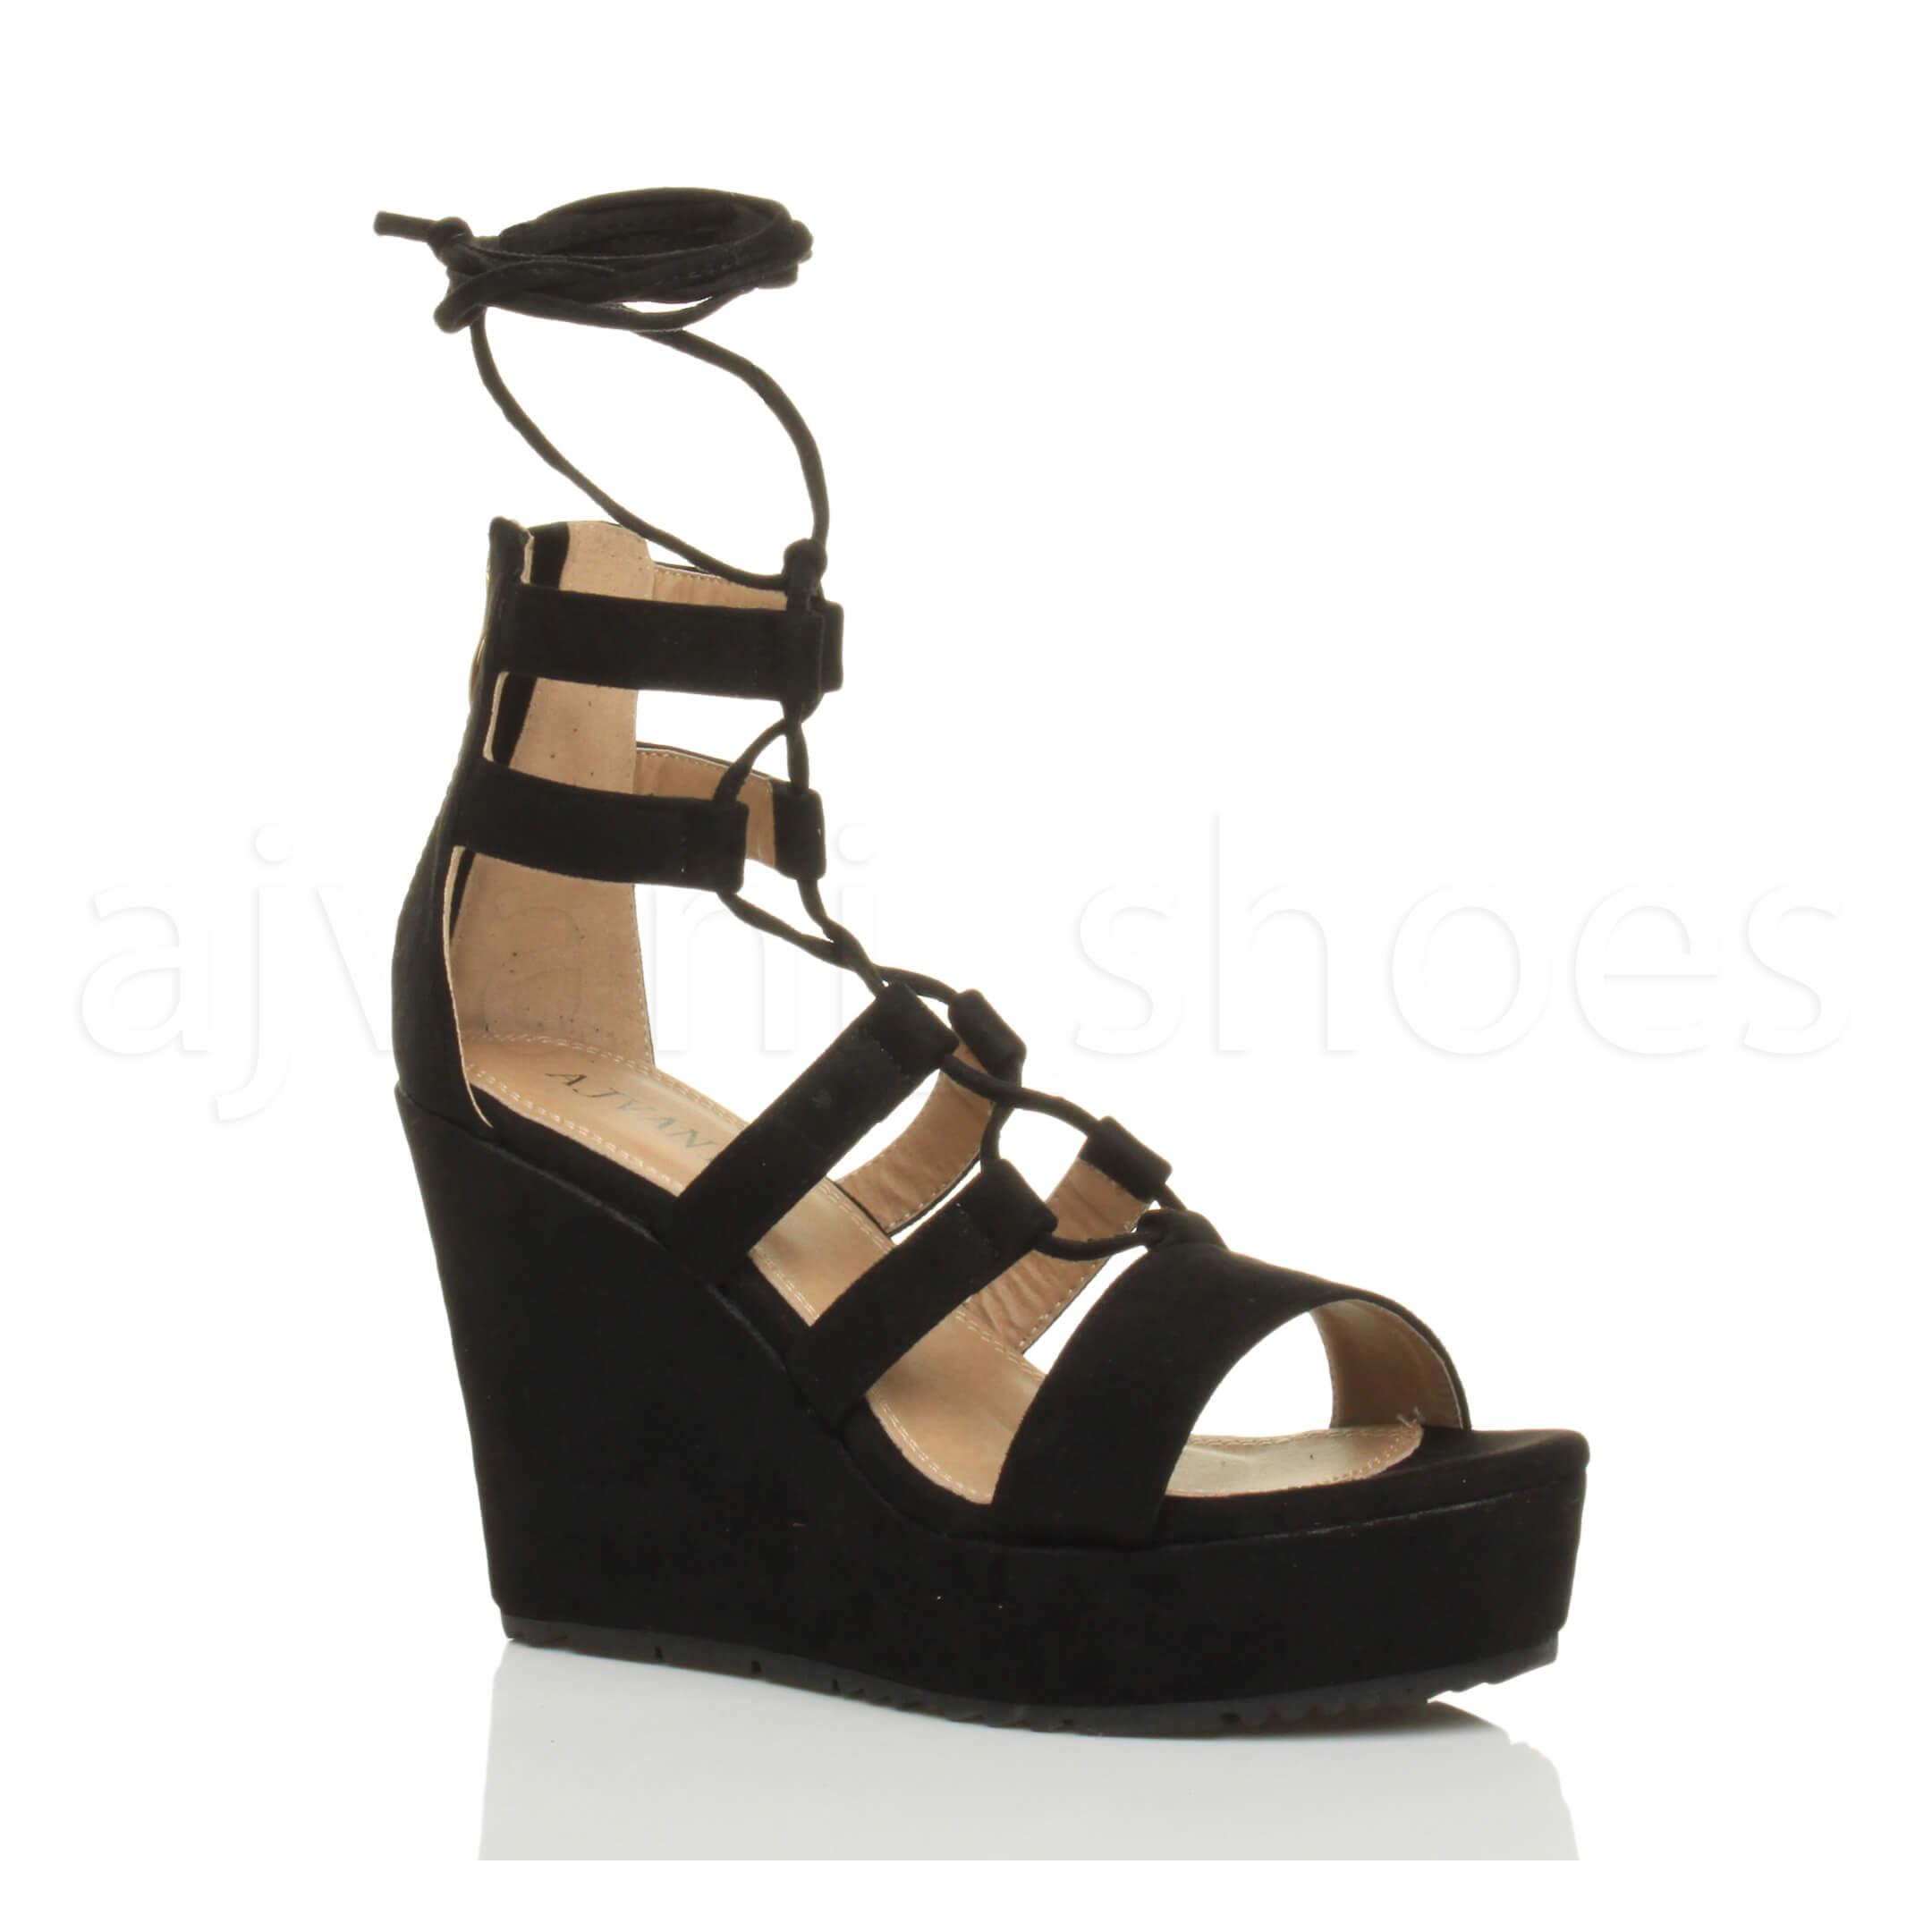 Donna zeppa alta cinturino stringhe gladiatore sandali scarpe numero 3 36 WbAIHnx4